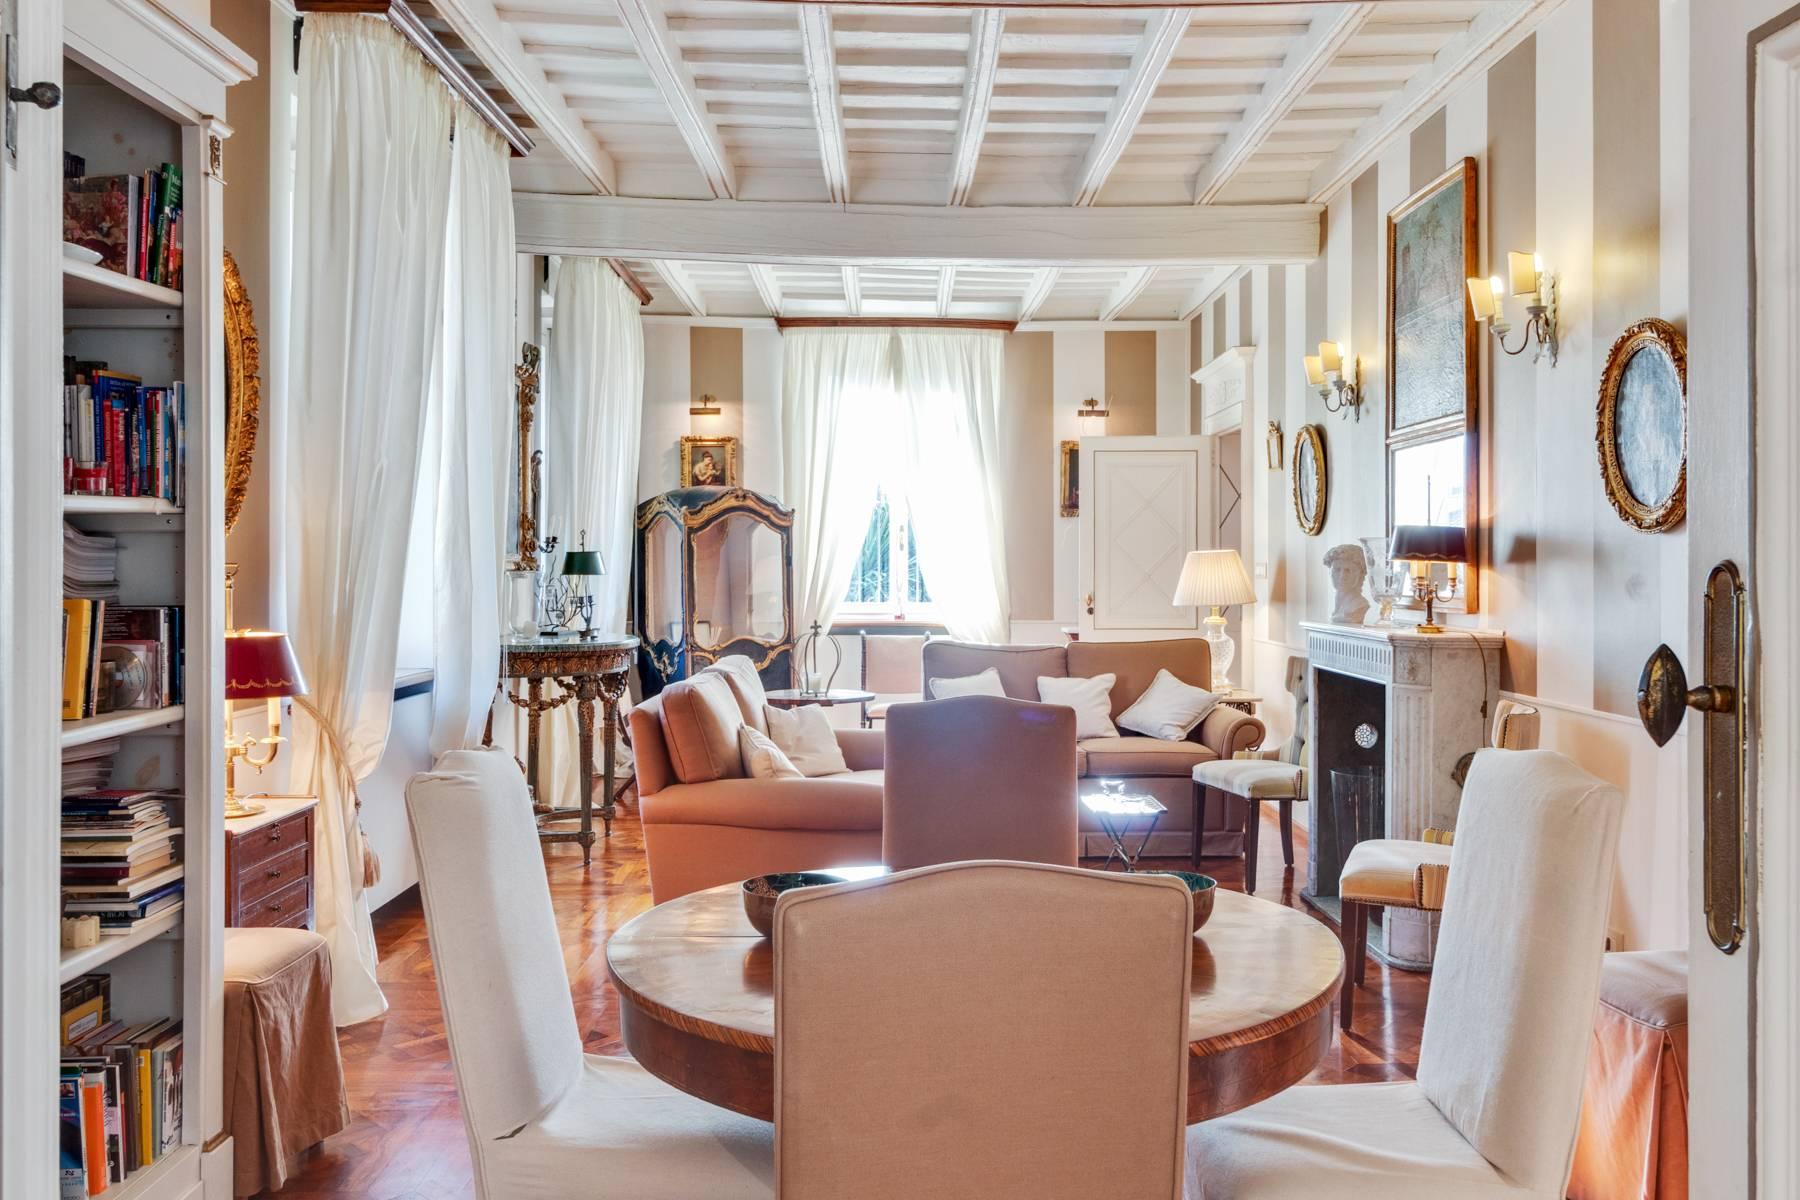 Casa indipendente in Vendita a Torino: 5 locali, 270 mq - Foto 3